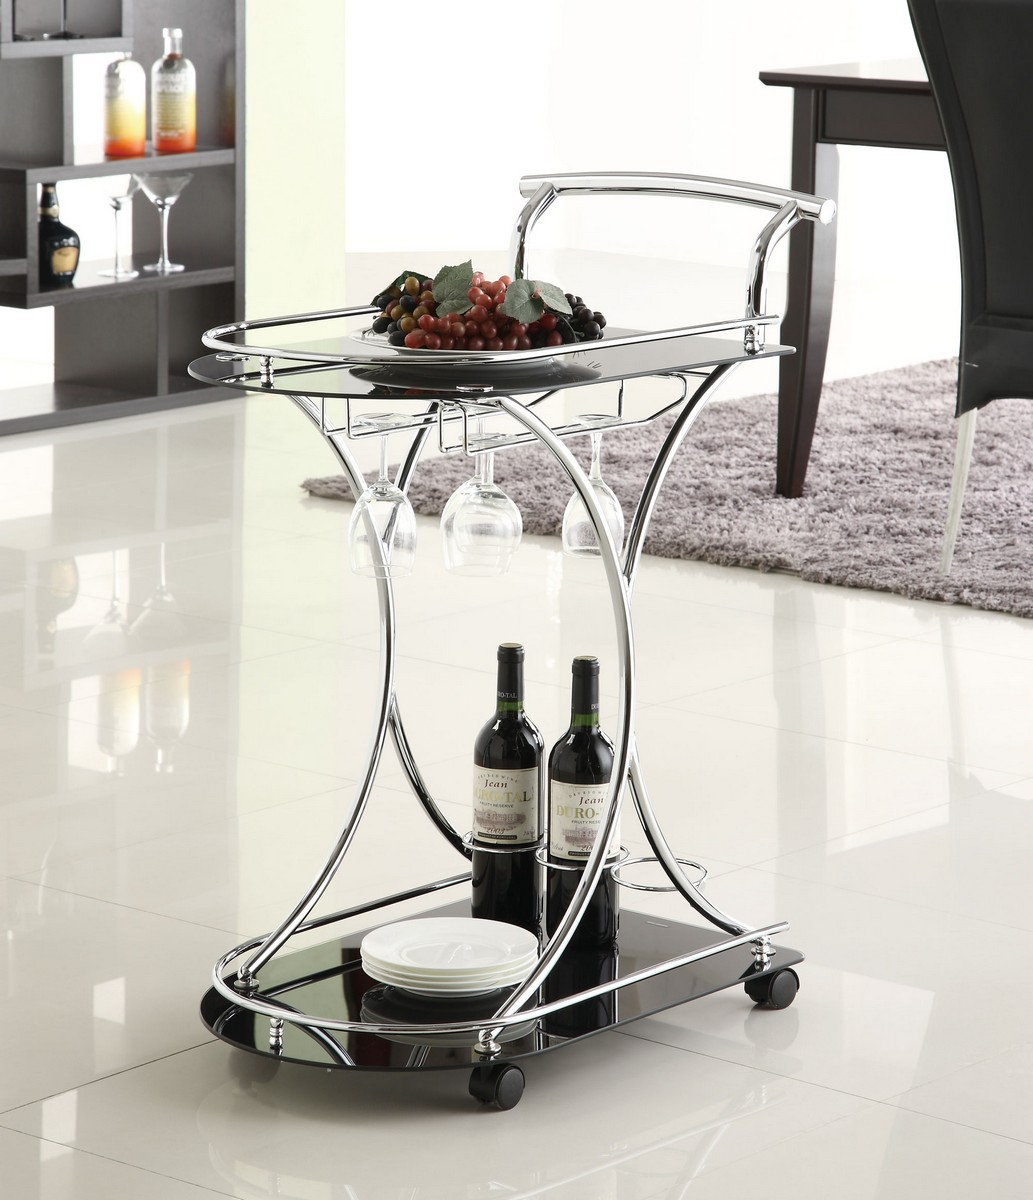 Coaster 910001 Serving Cart - Chrome/Black Glass